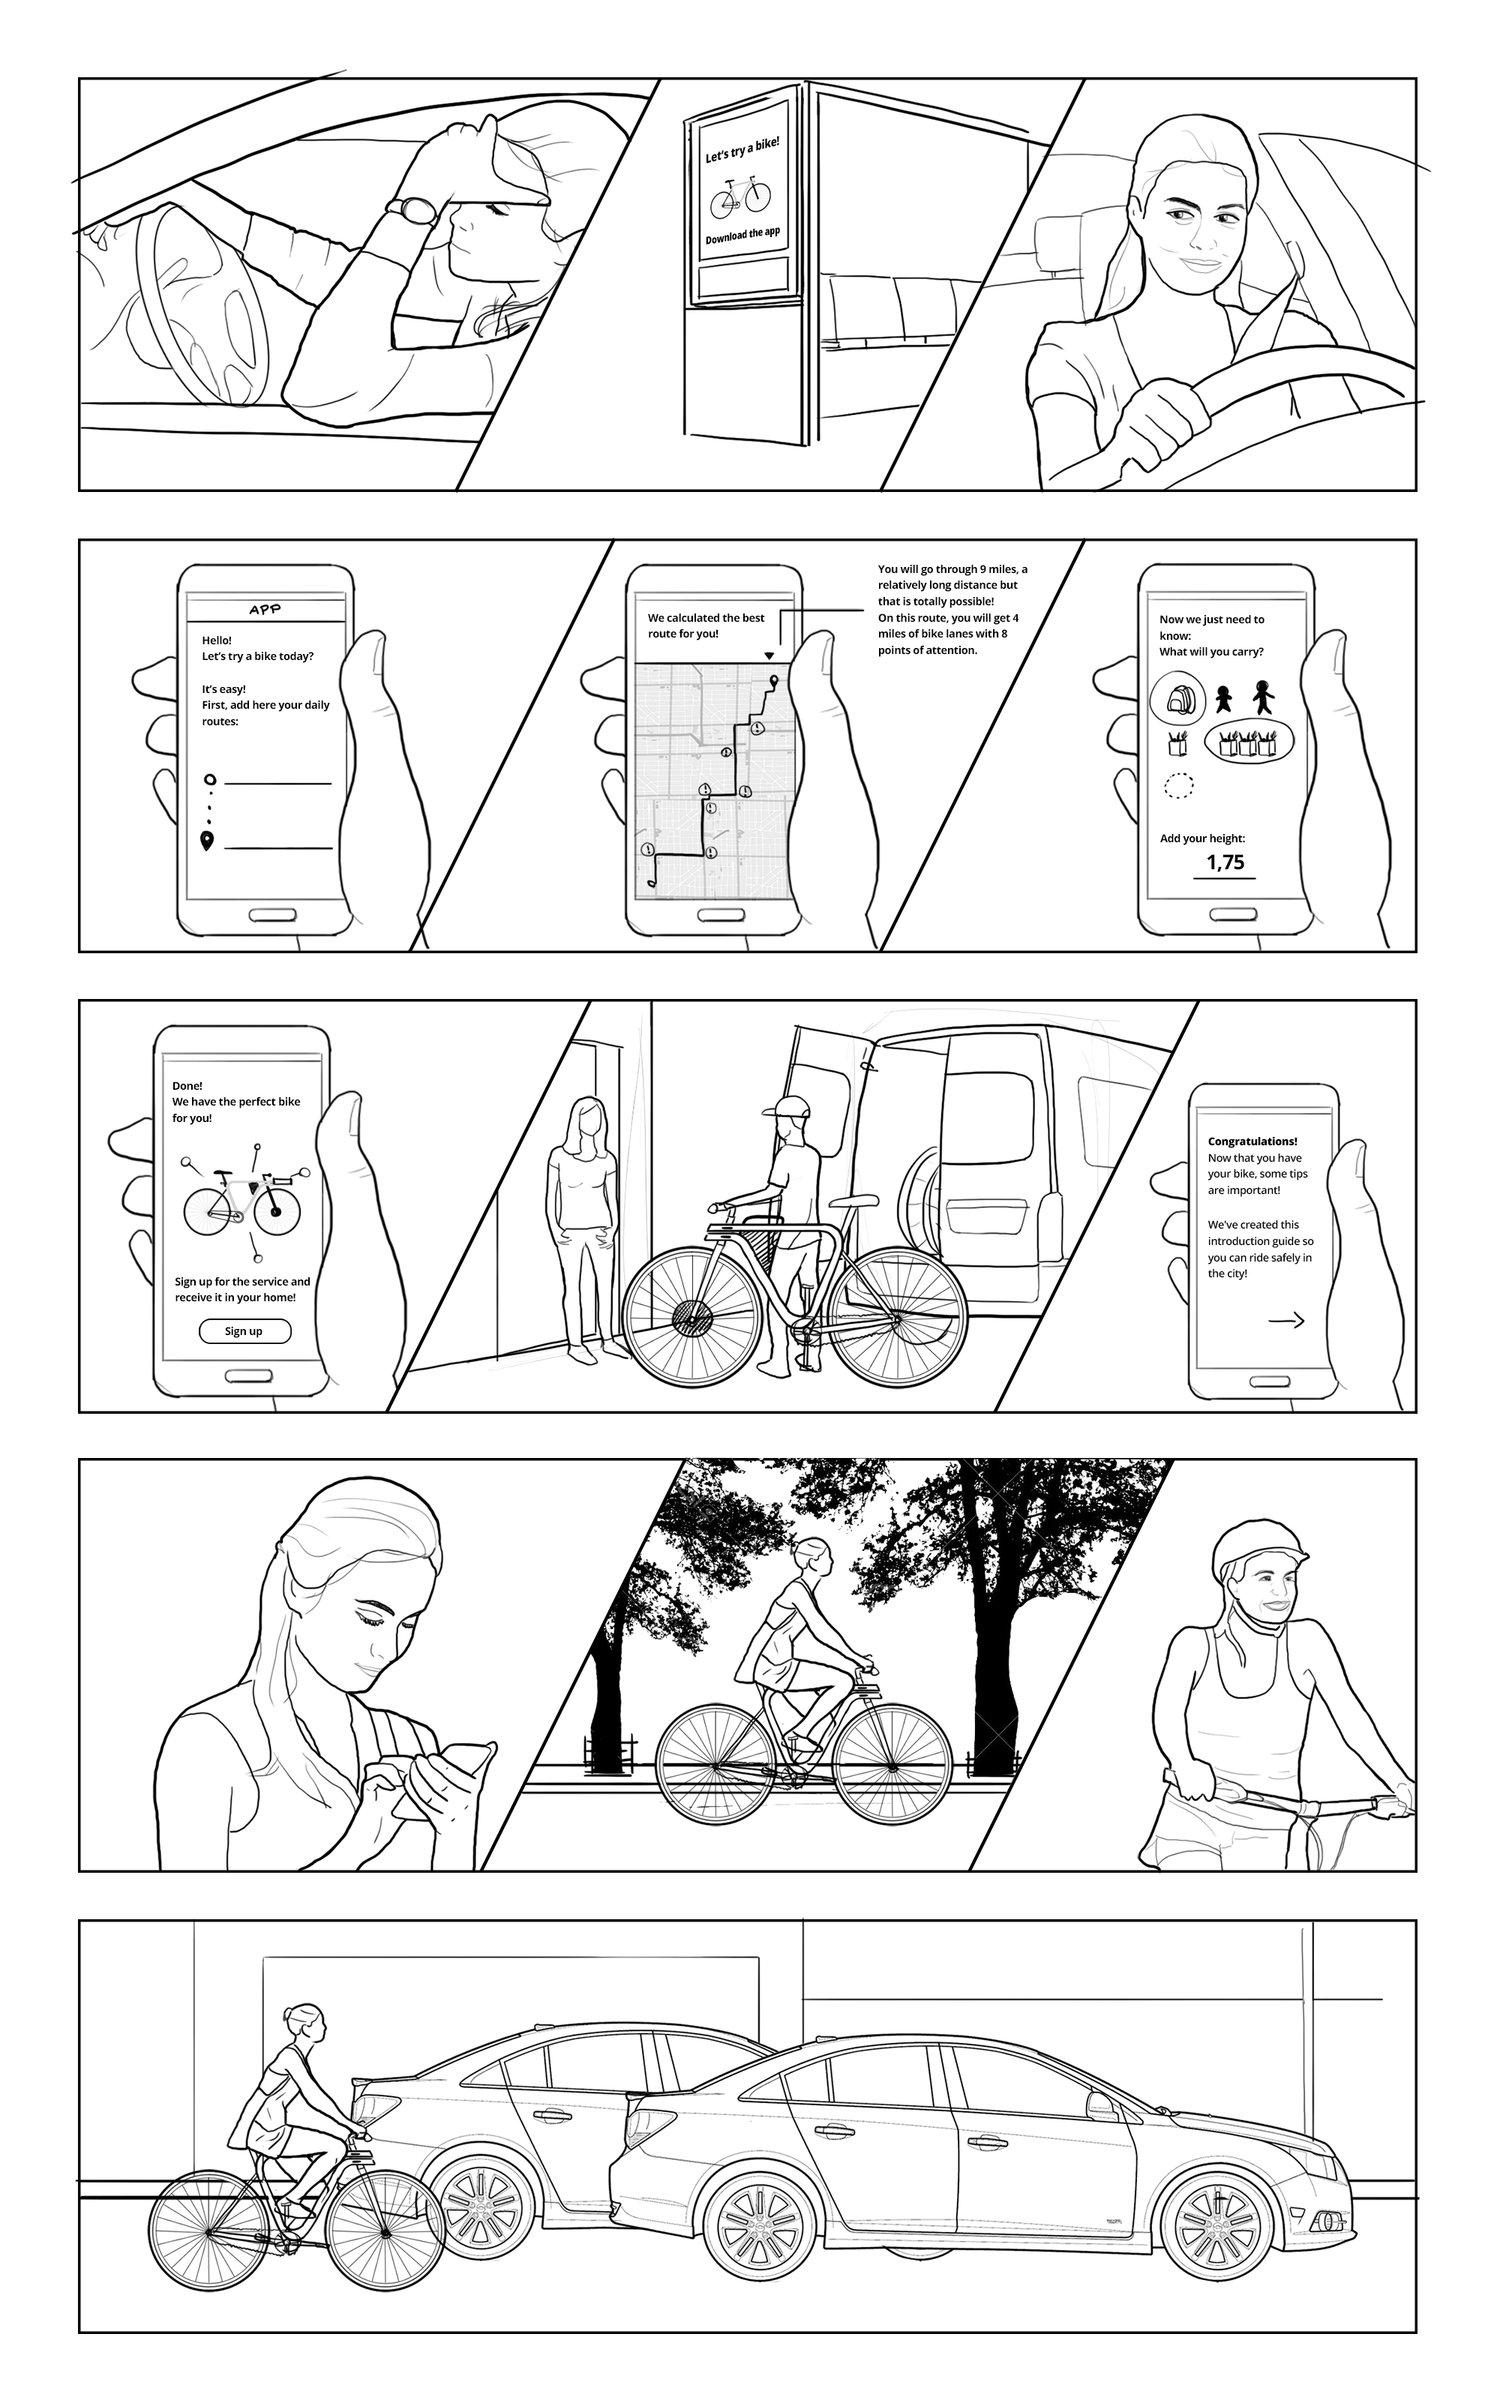 Umabike — danilo saito